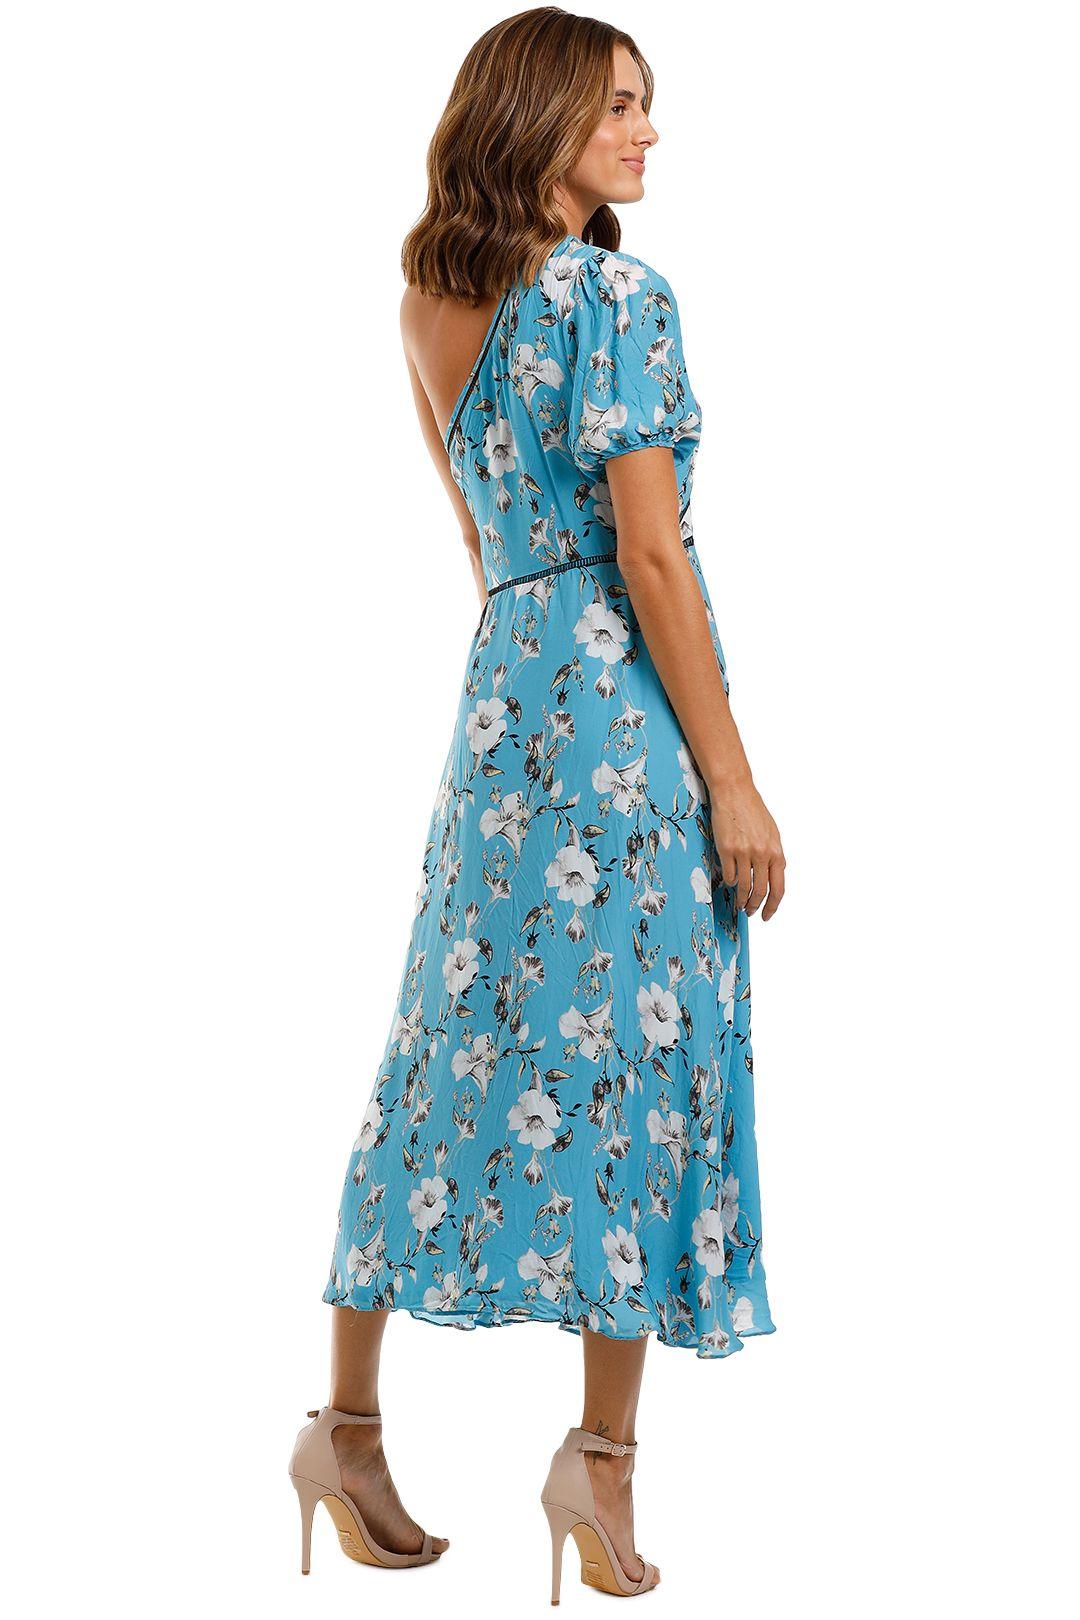 Talulah Cannes Midi Dress Blue Valentine Floral Asymmetrical